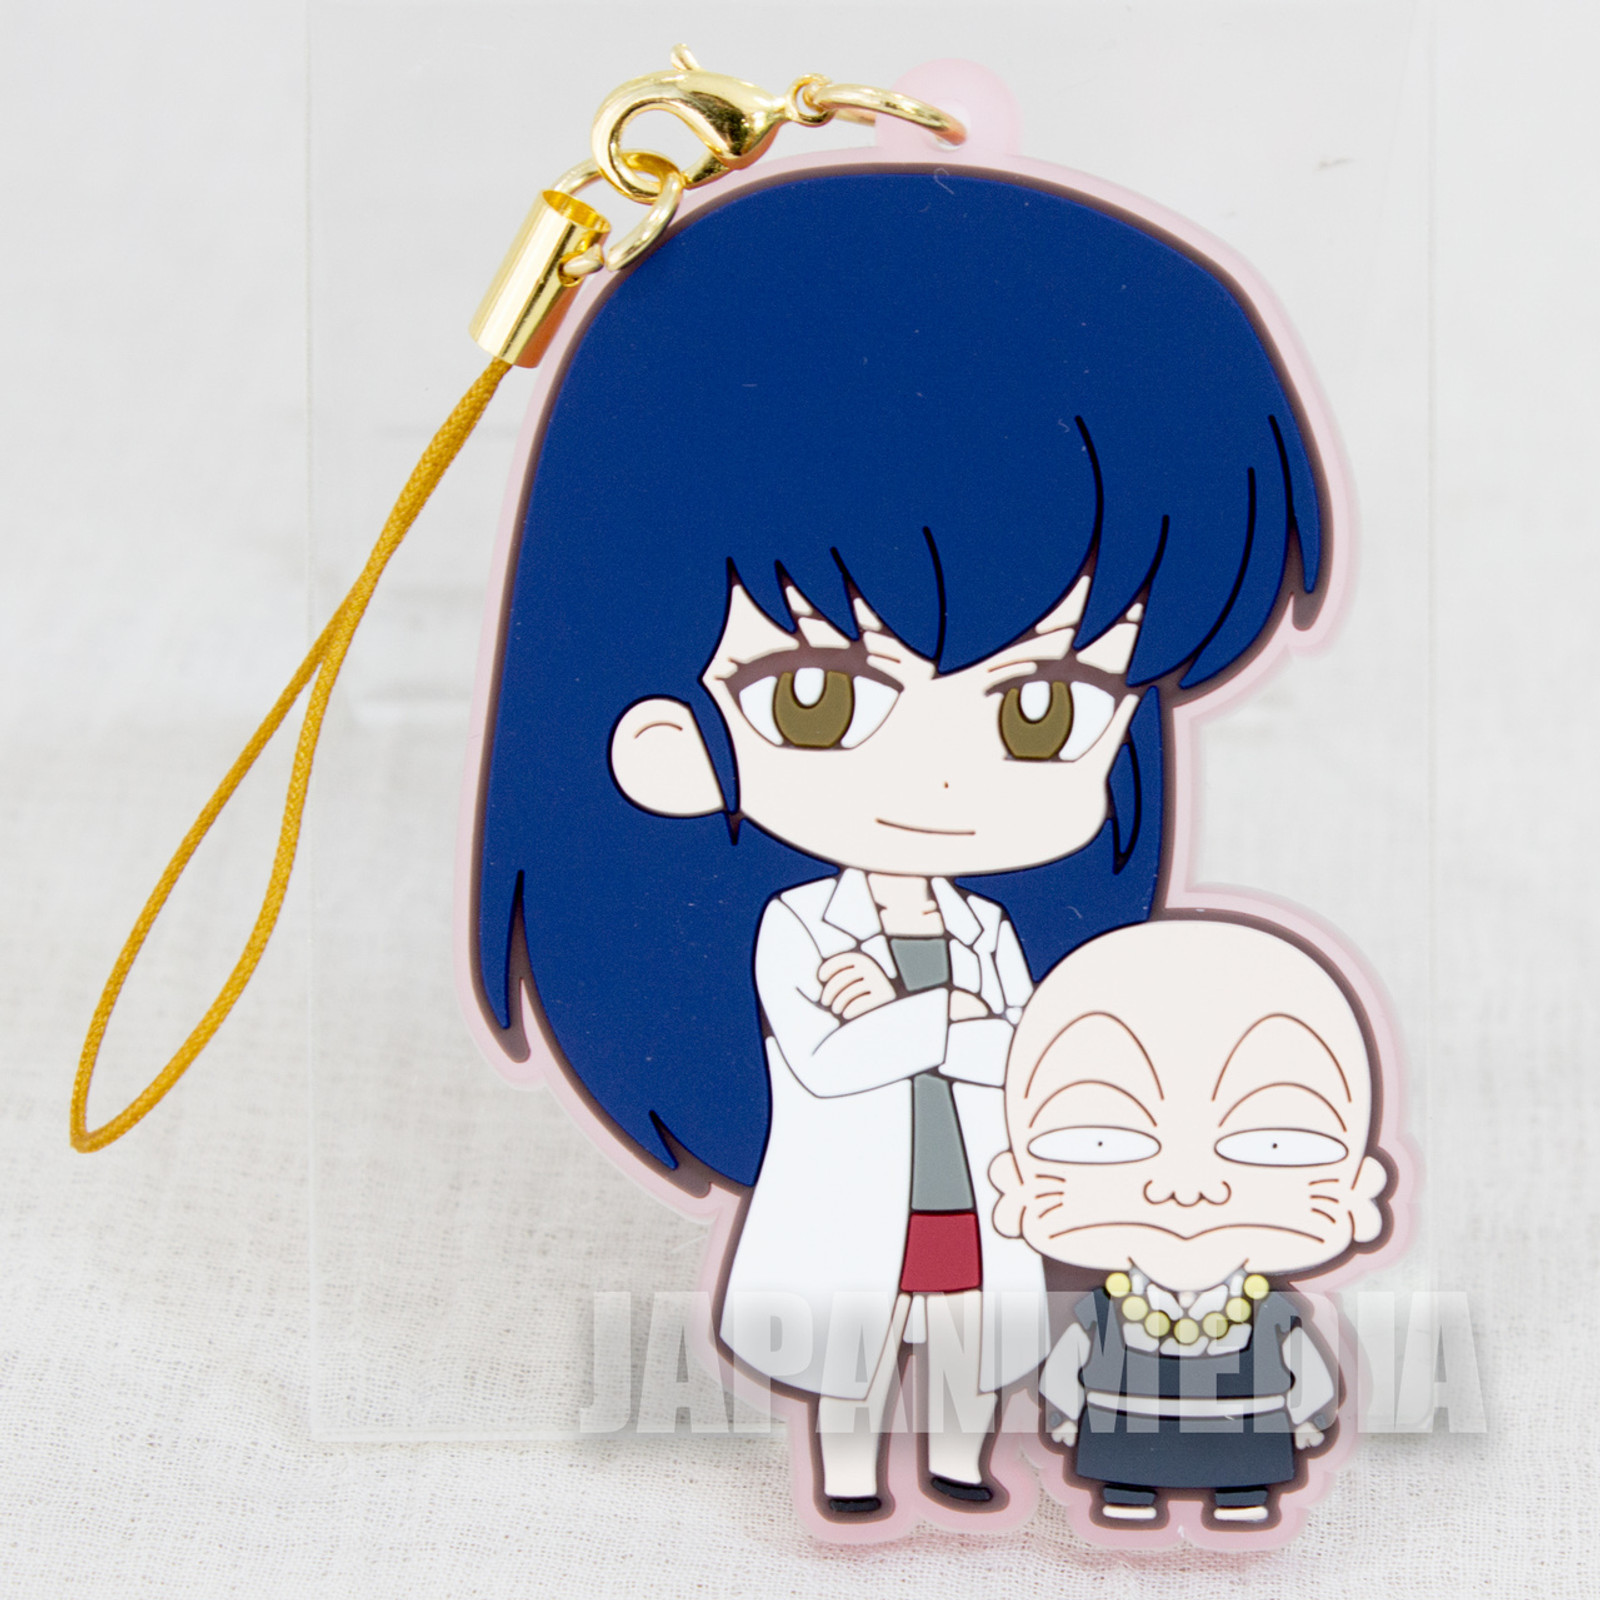 Urusei Yatsura Sakura & Sakuranbou Mascot Rubber Strap JAPAN ANIME MANGA